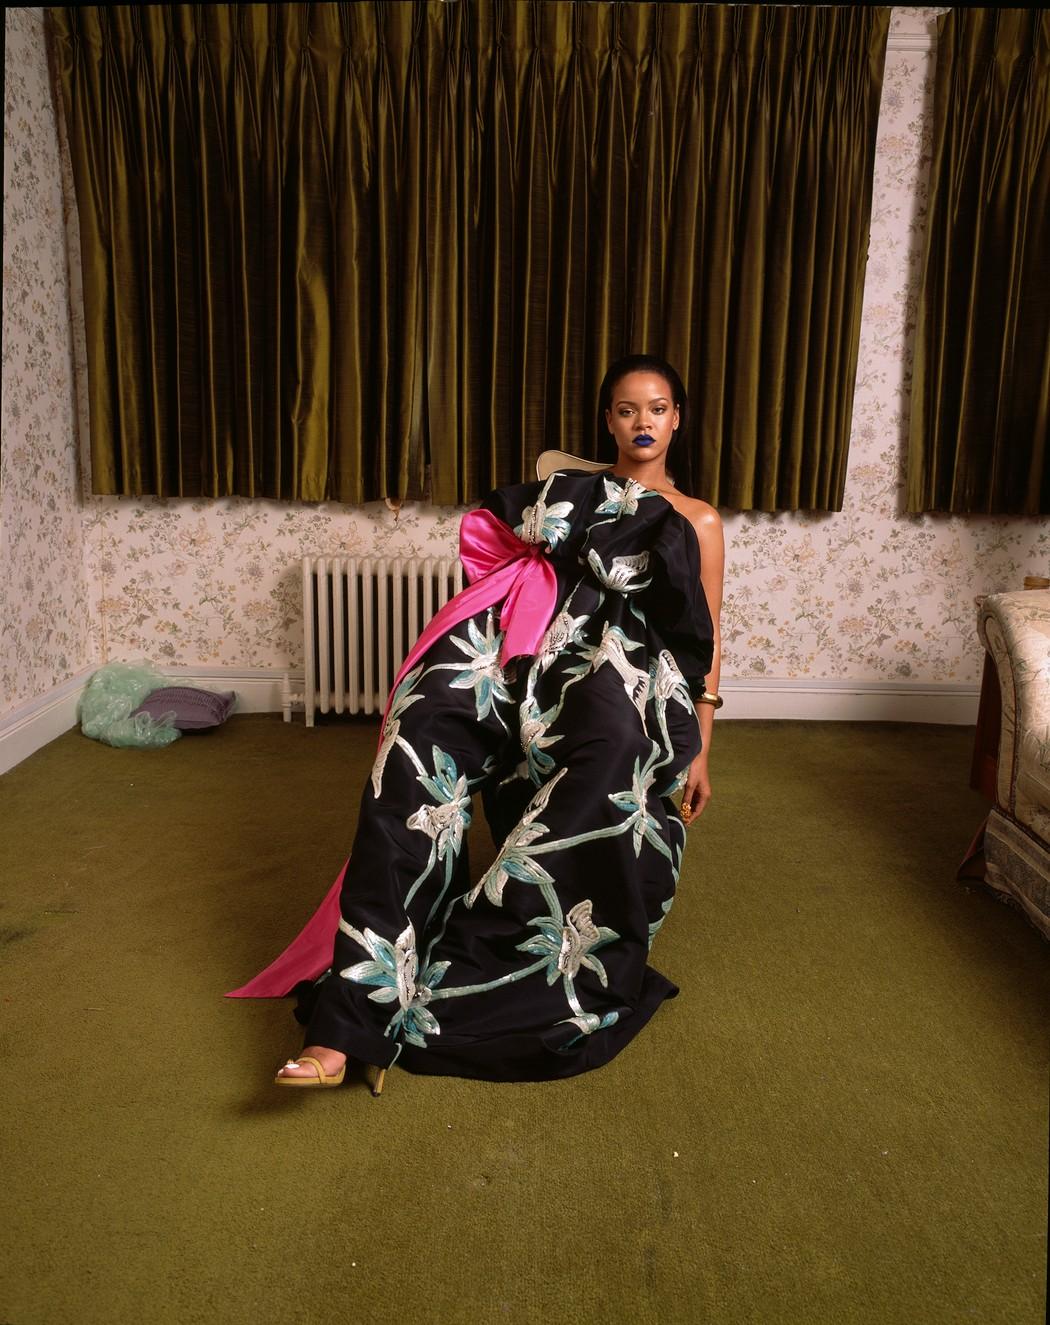 [Image: 1535978781404-Rihanna-by-Deana-Lawson-2....ize=1050:*]